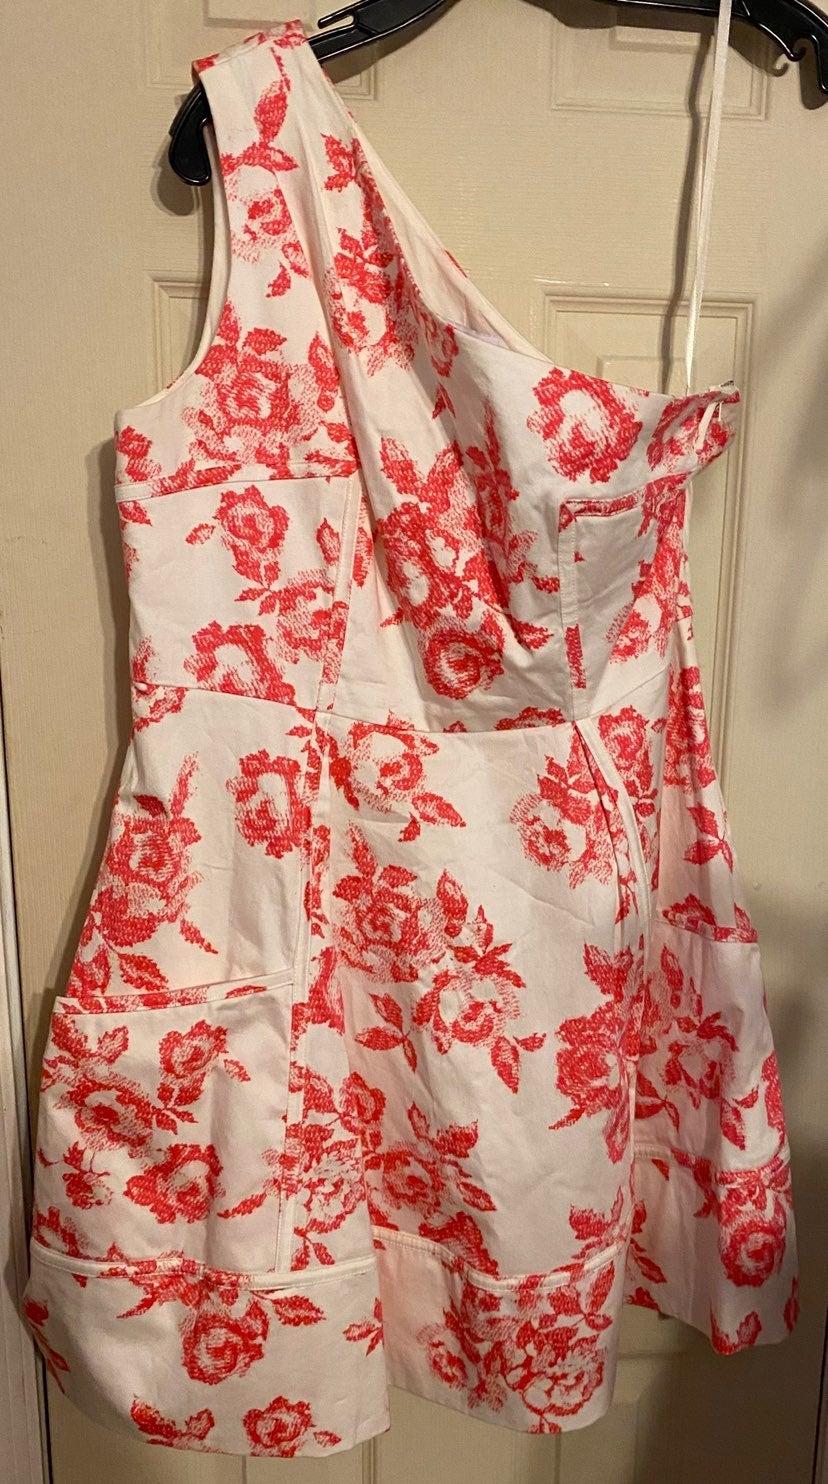 Size 14 Jessica Simpson dress